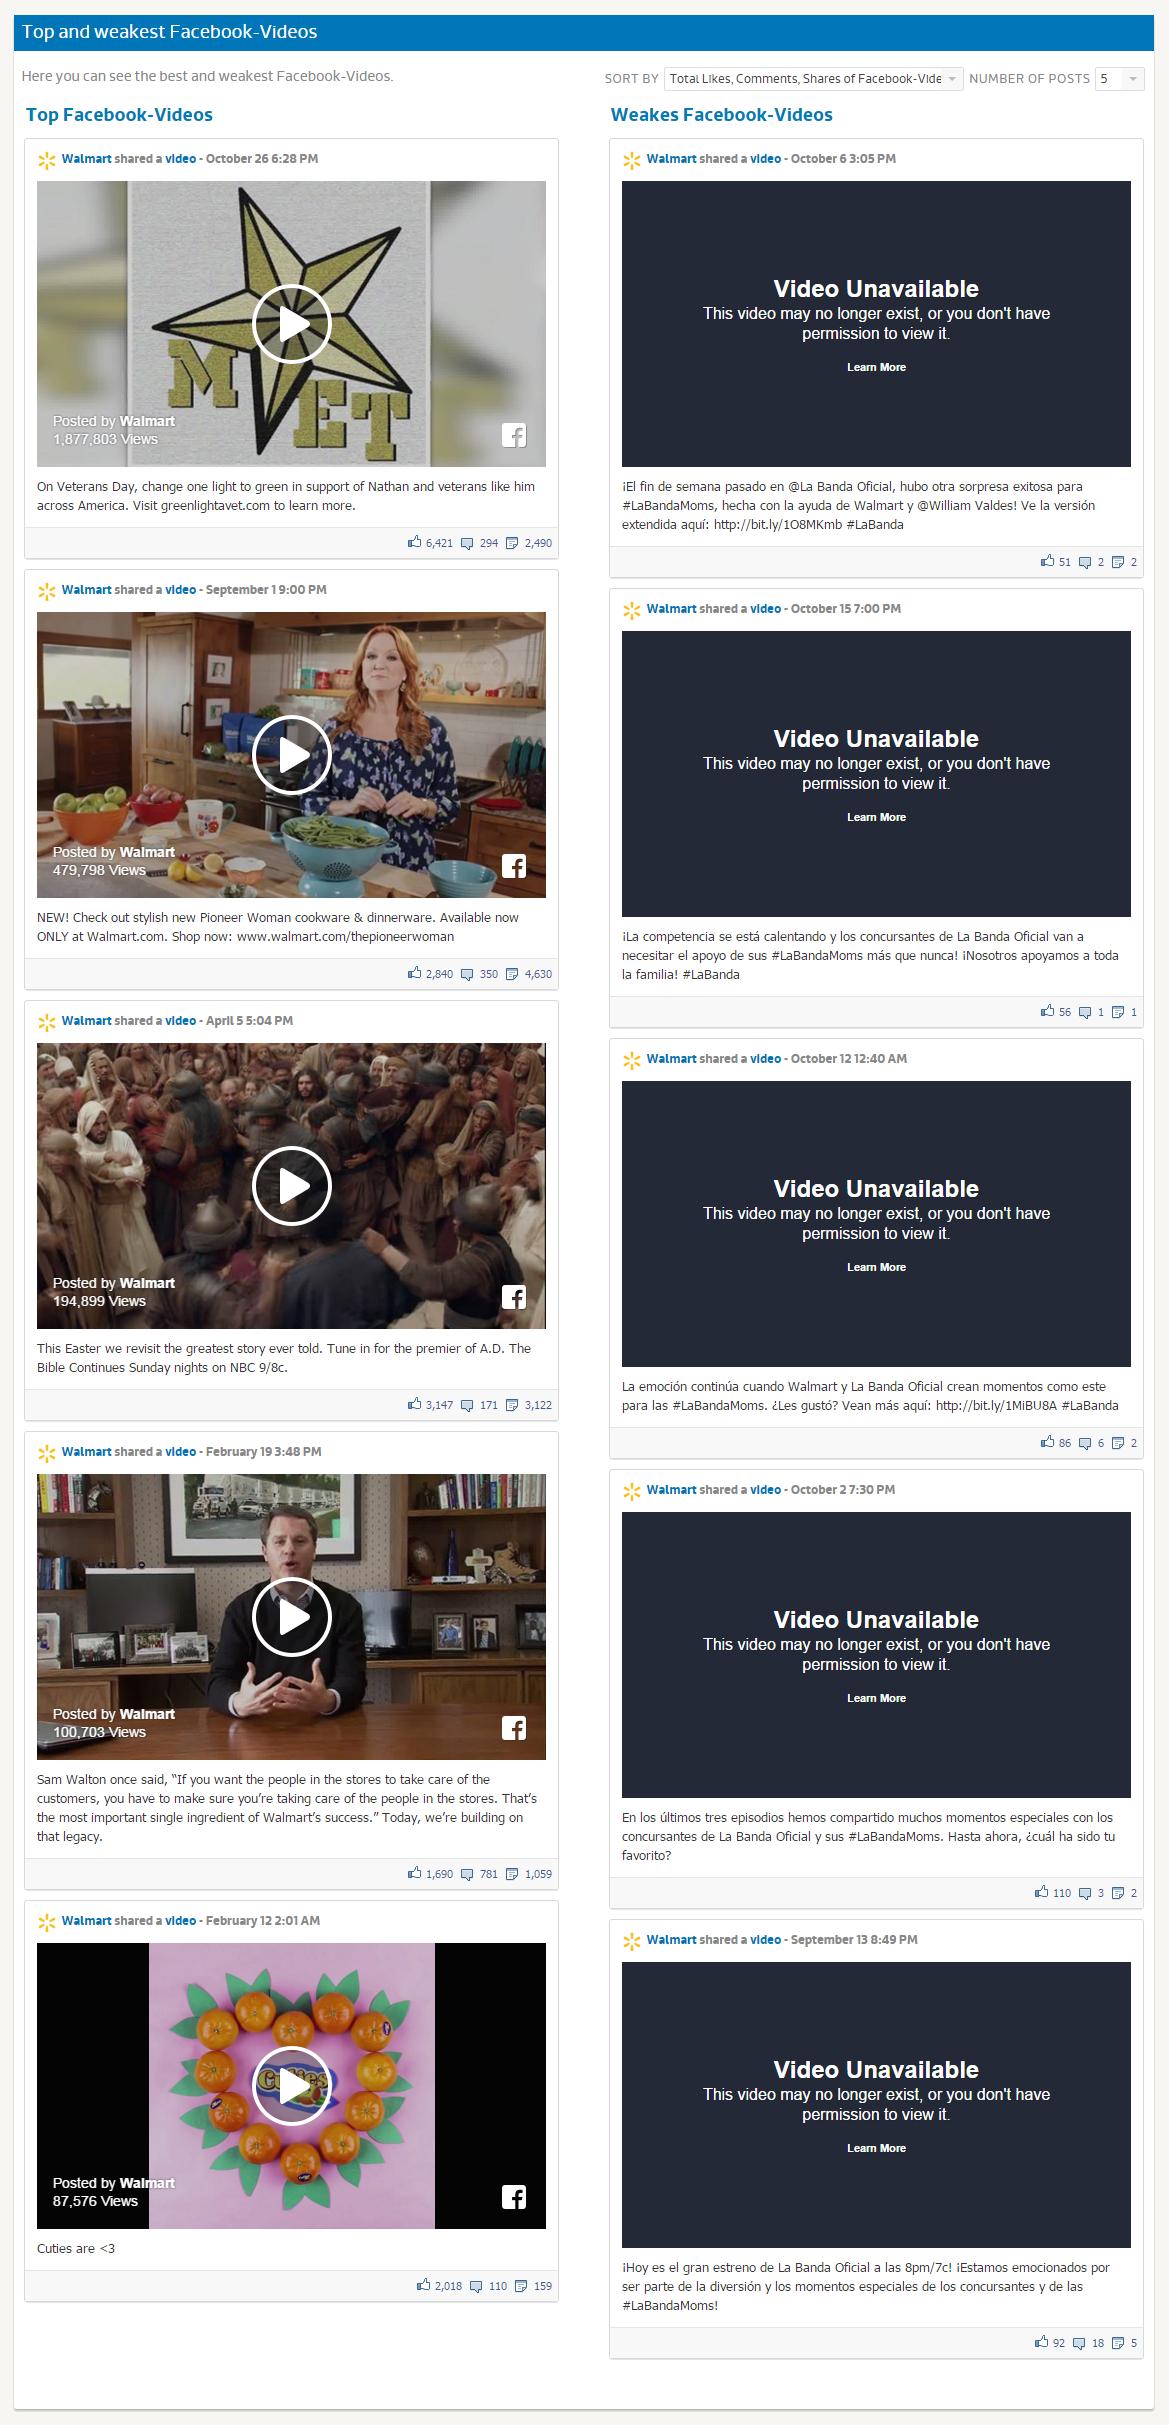 Media Research - Walmart on FB (19)